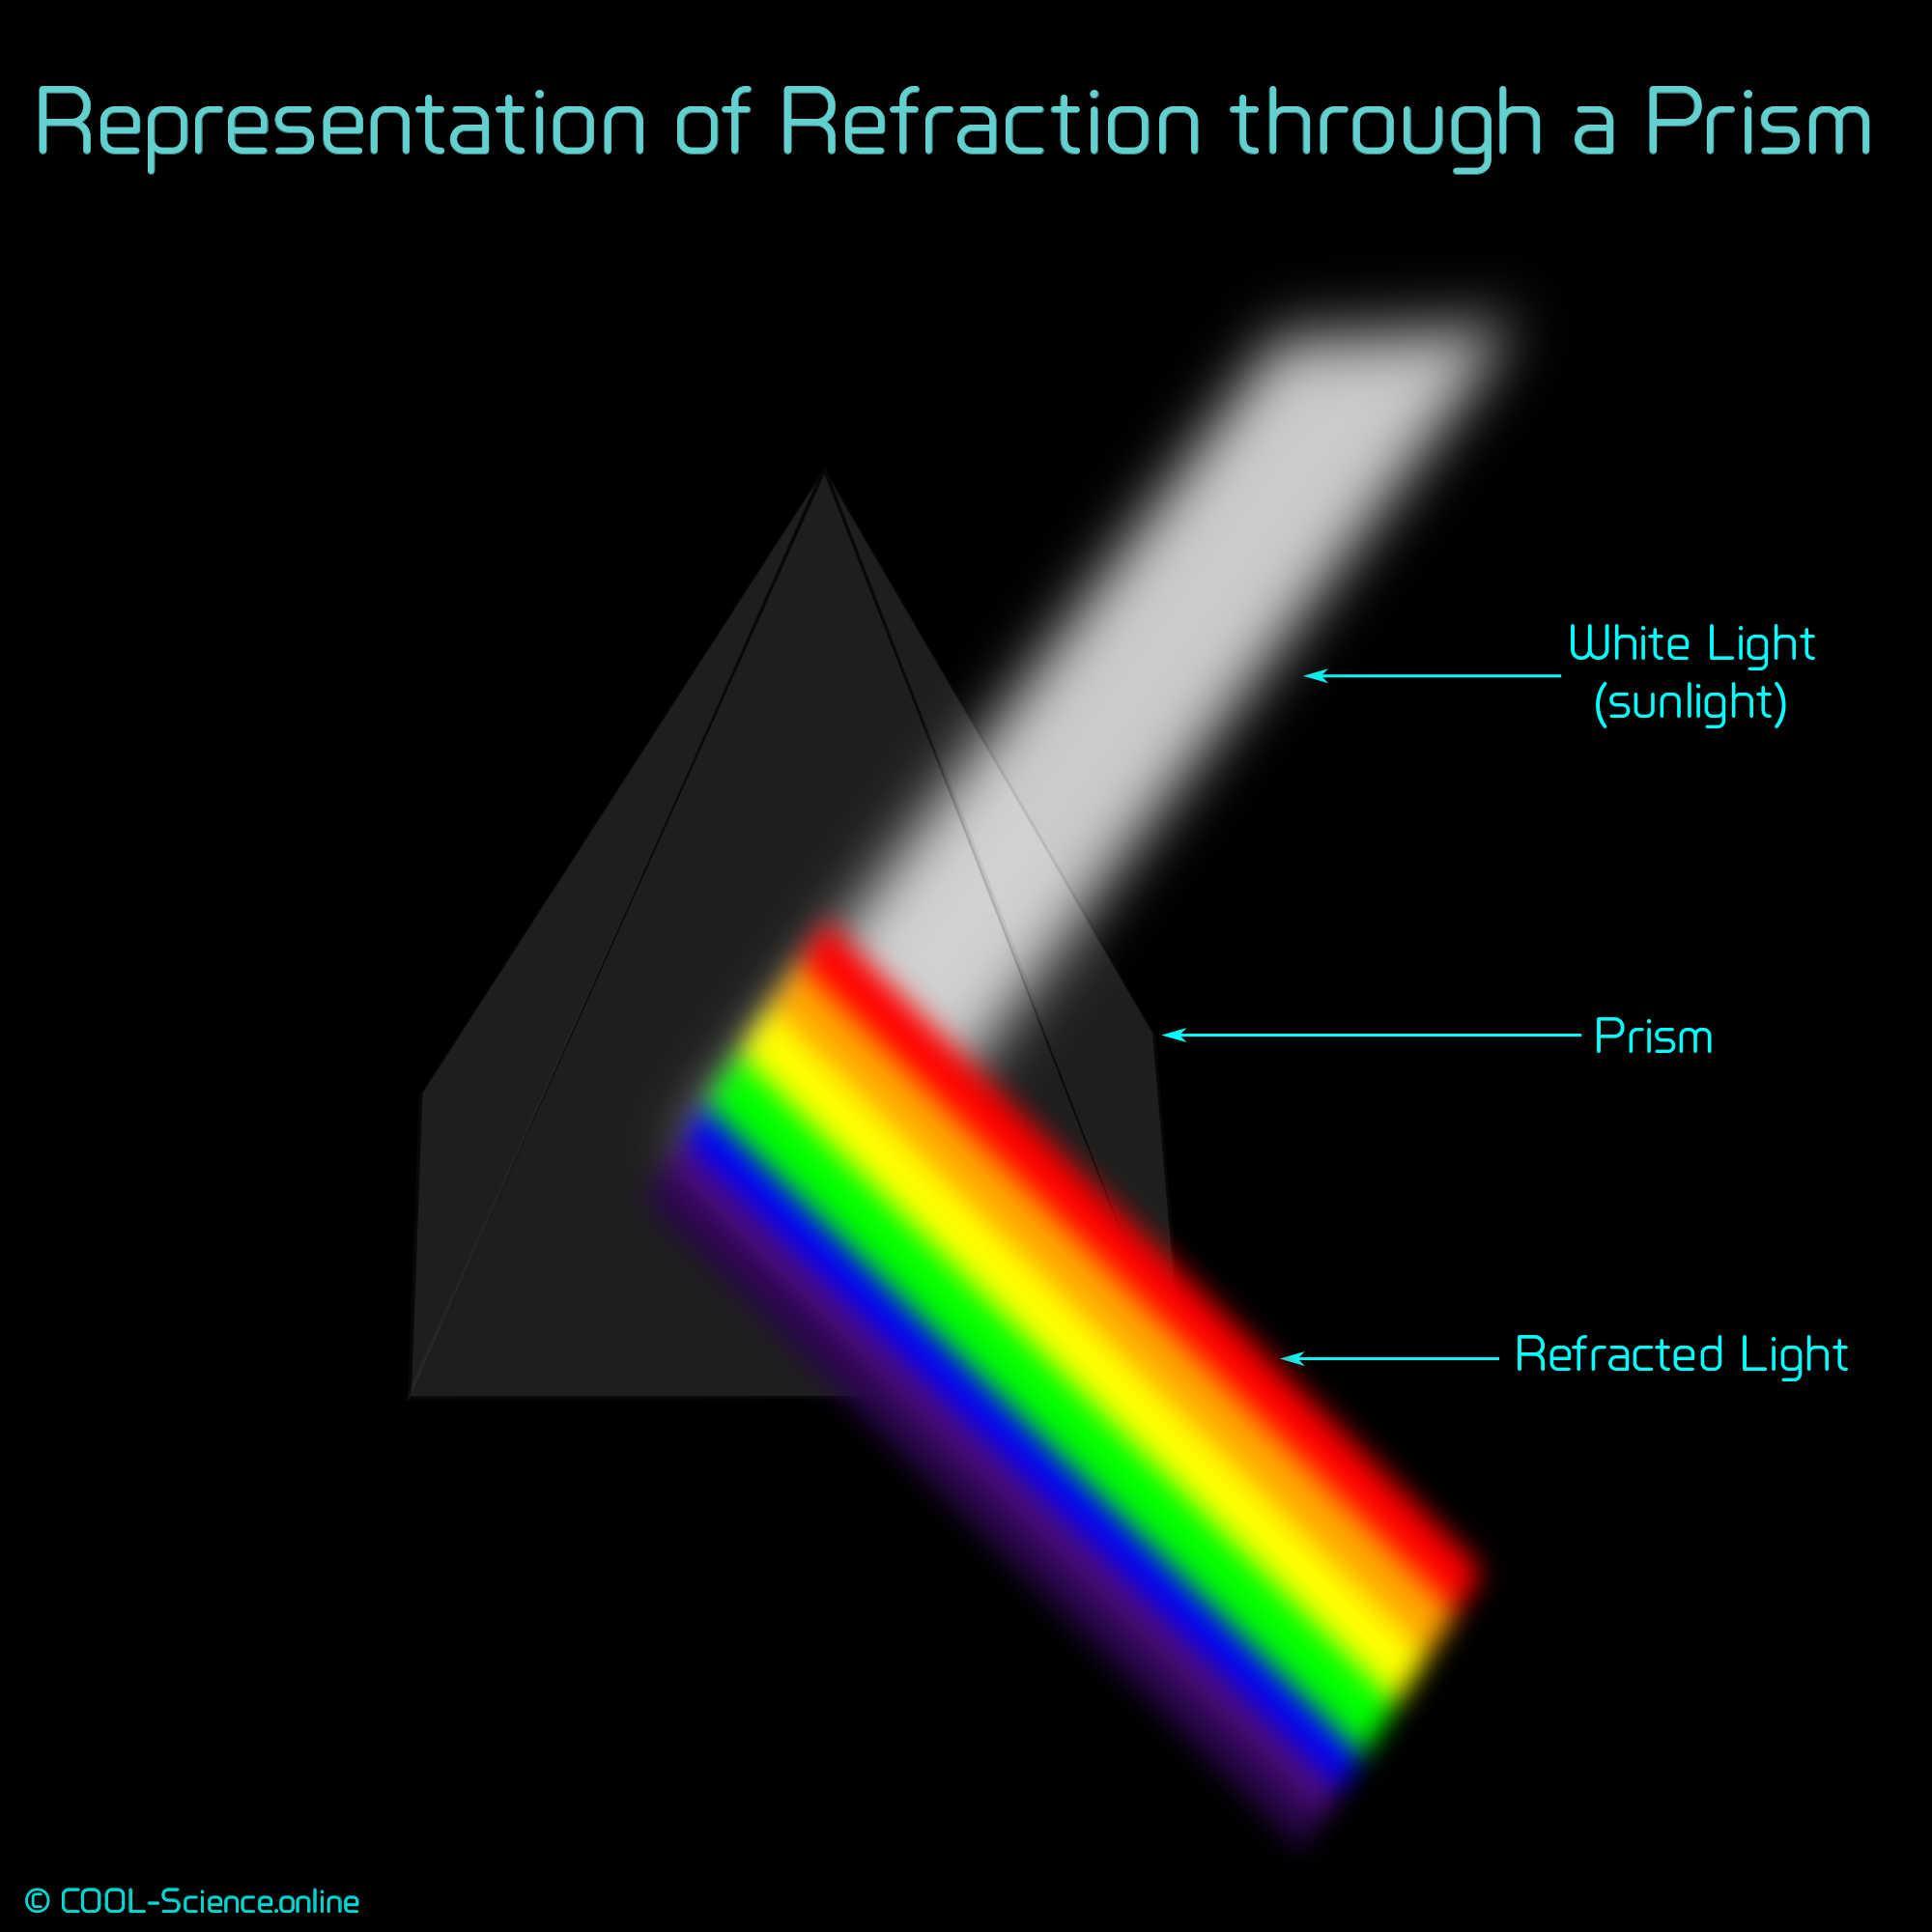 Representation of Refraction through a Prism